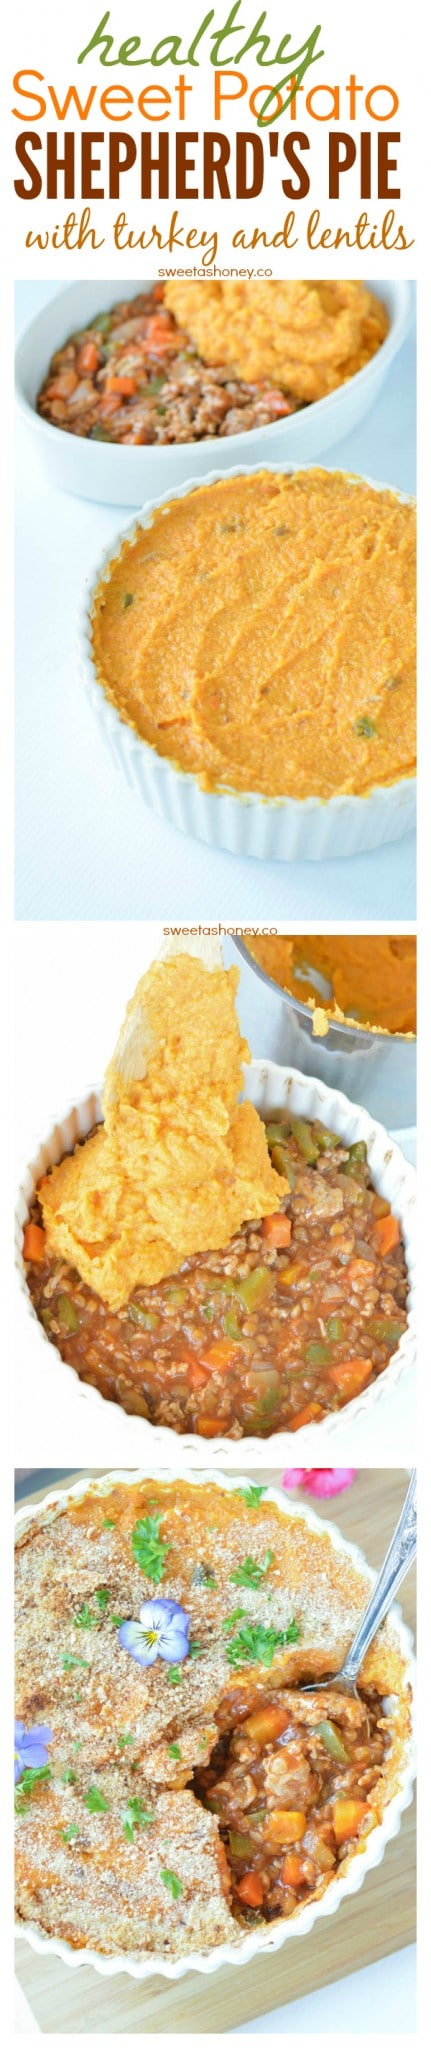 Healthy Sweet Potatoes Shepherd's Pie